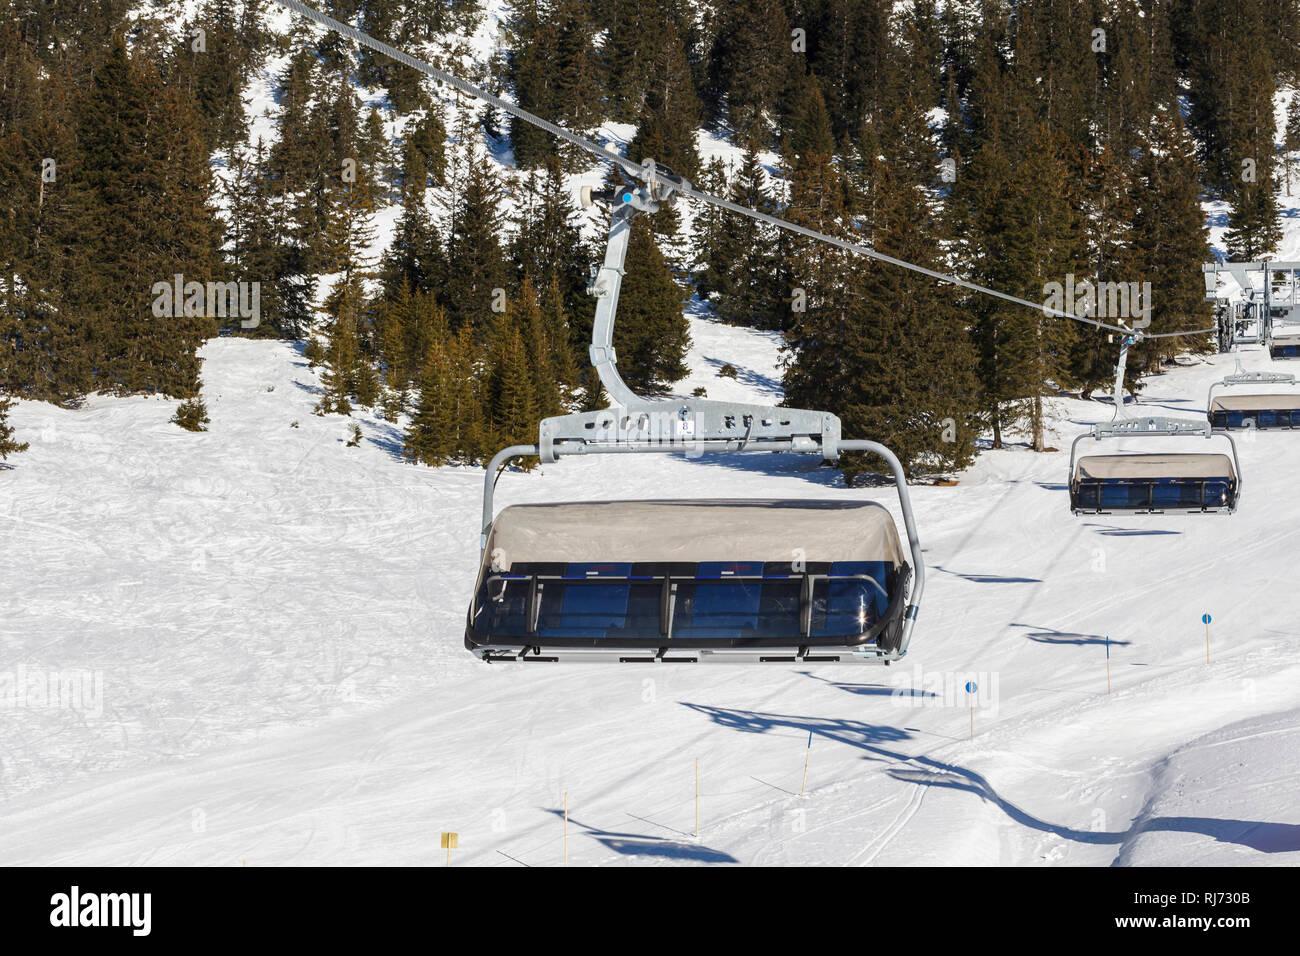 Wintersport in traumhafter Bergkulisse, leere Gondeln eines Sessellifts, - Stock Image